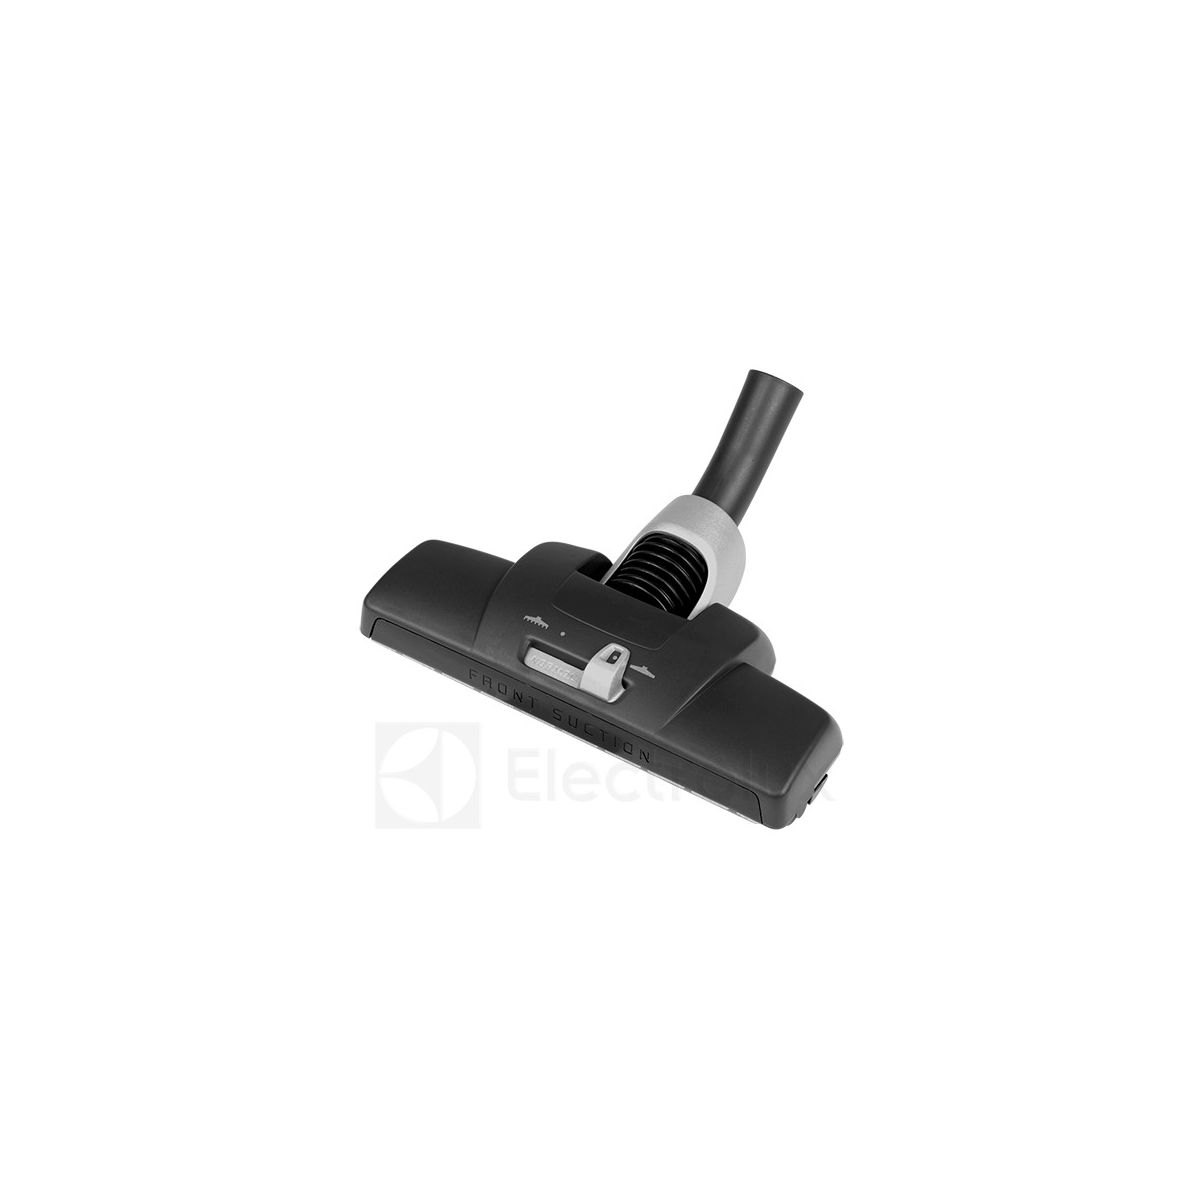 ELECTROLUX ZE062 1 brosse + adaptateur